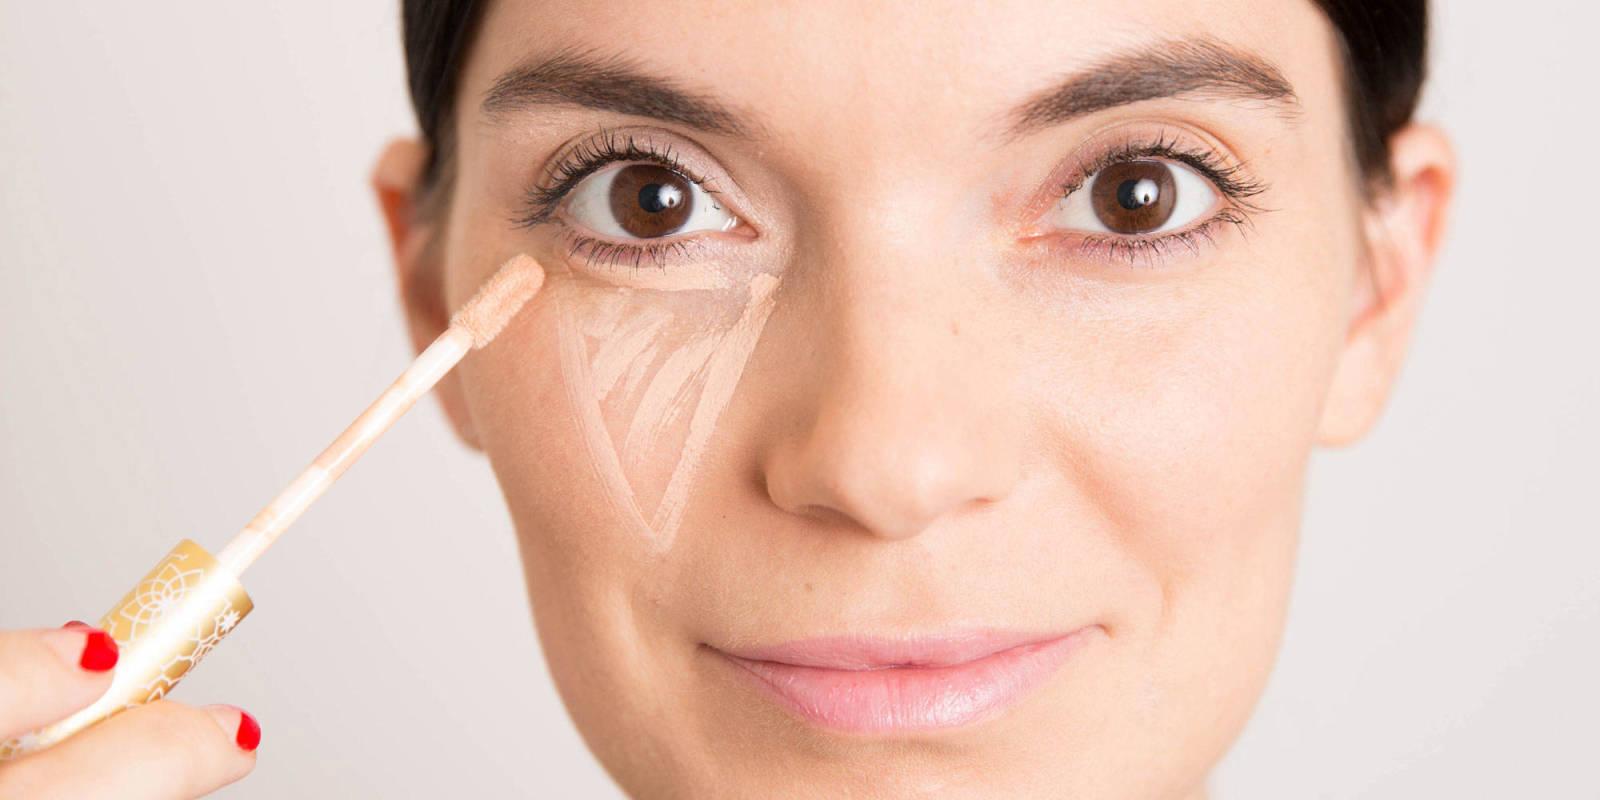 Eye makeup concealer